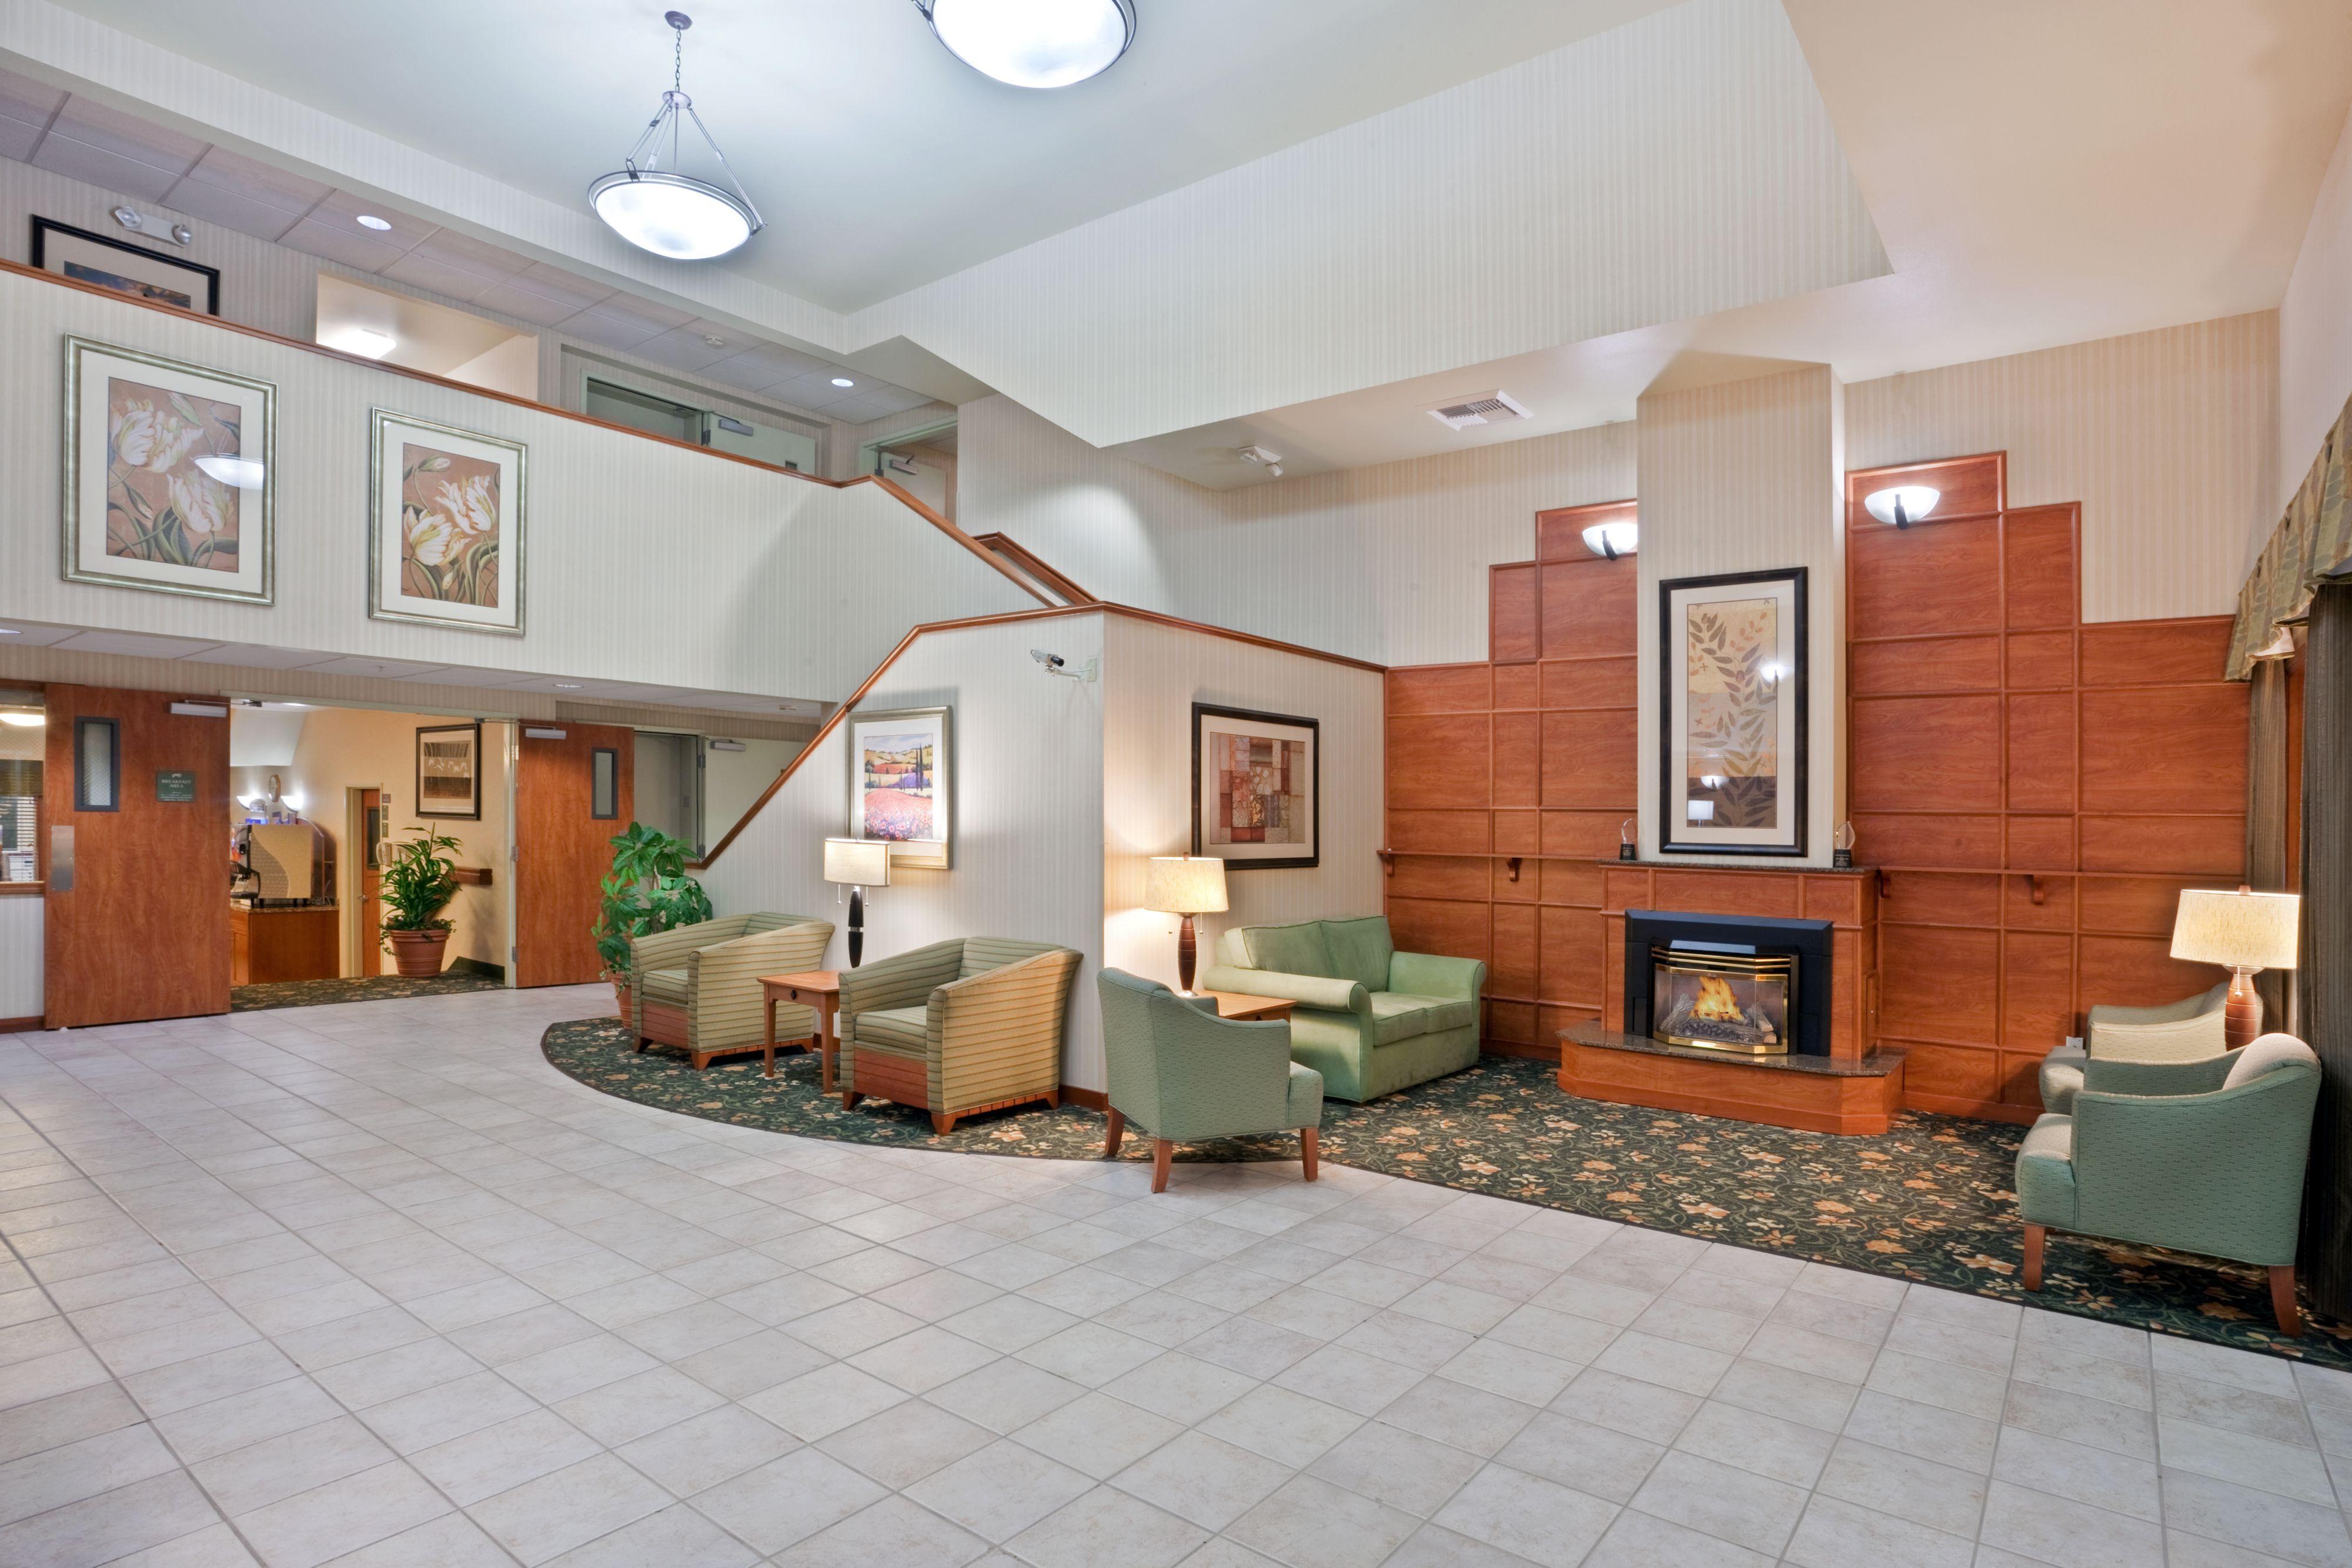 Holiday Inn Express & Suites Burlington image 4